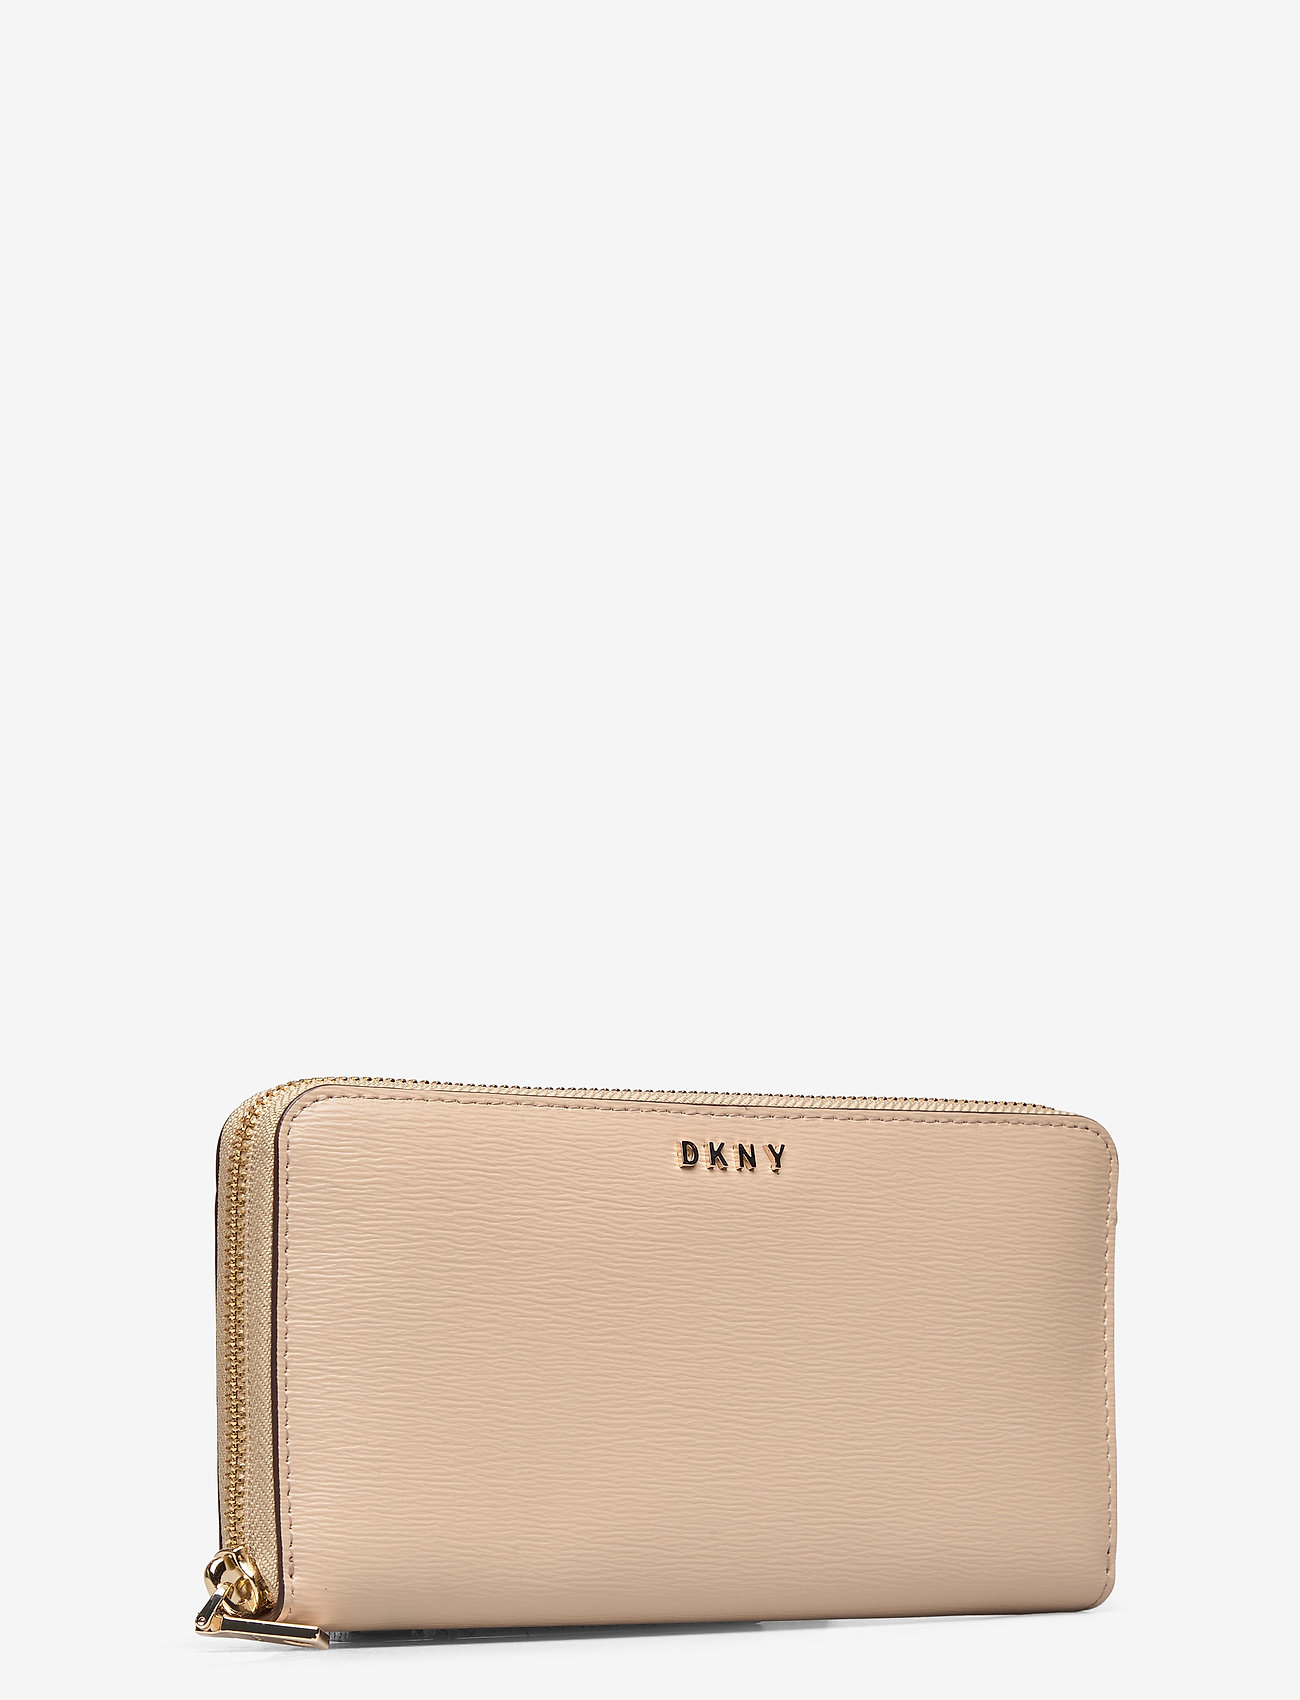 Slg Bryant (Sand) (76.80 €) - DKNY Bags aaIm9